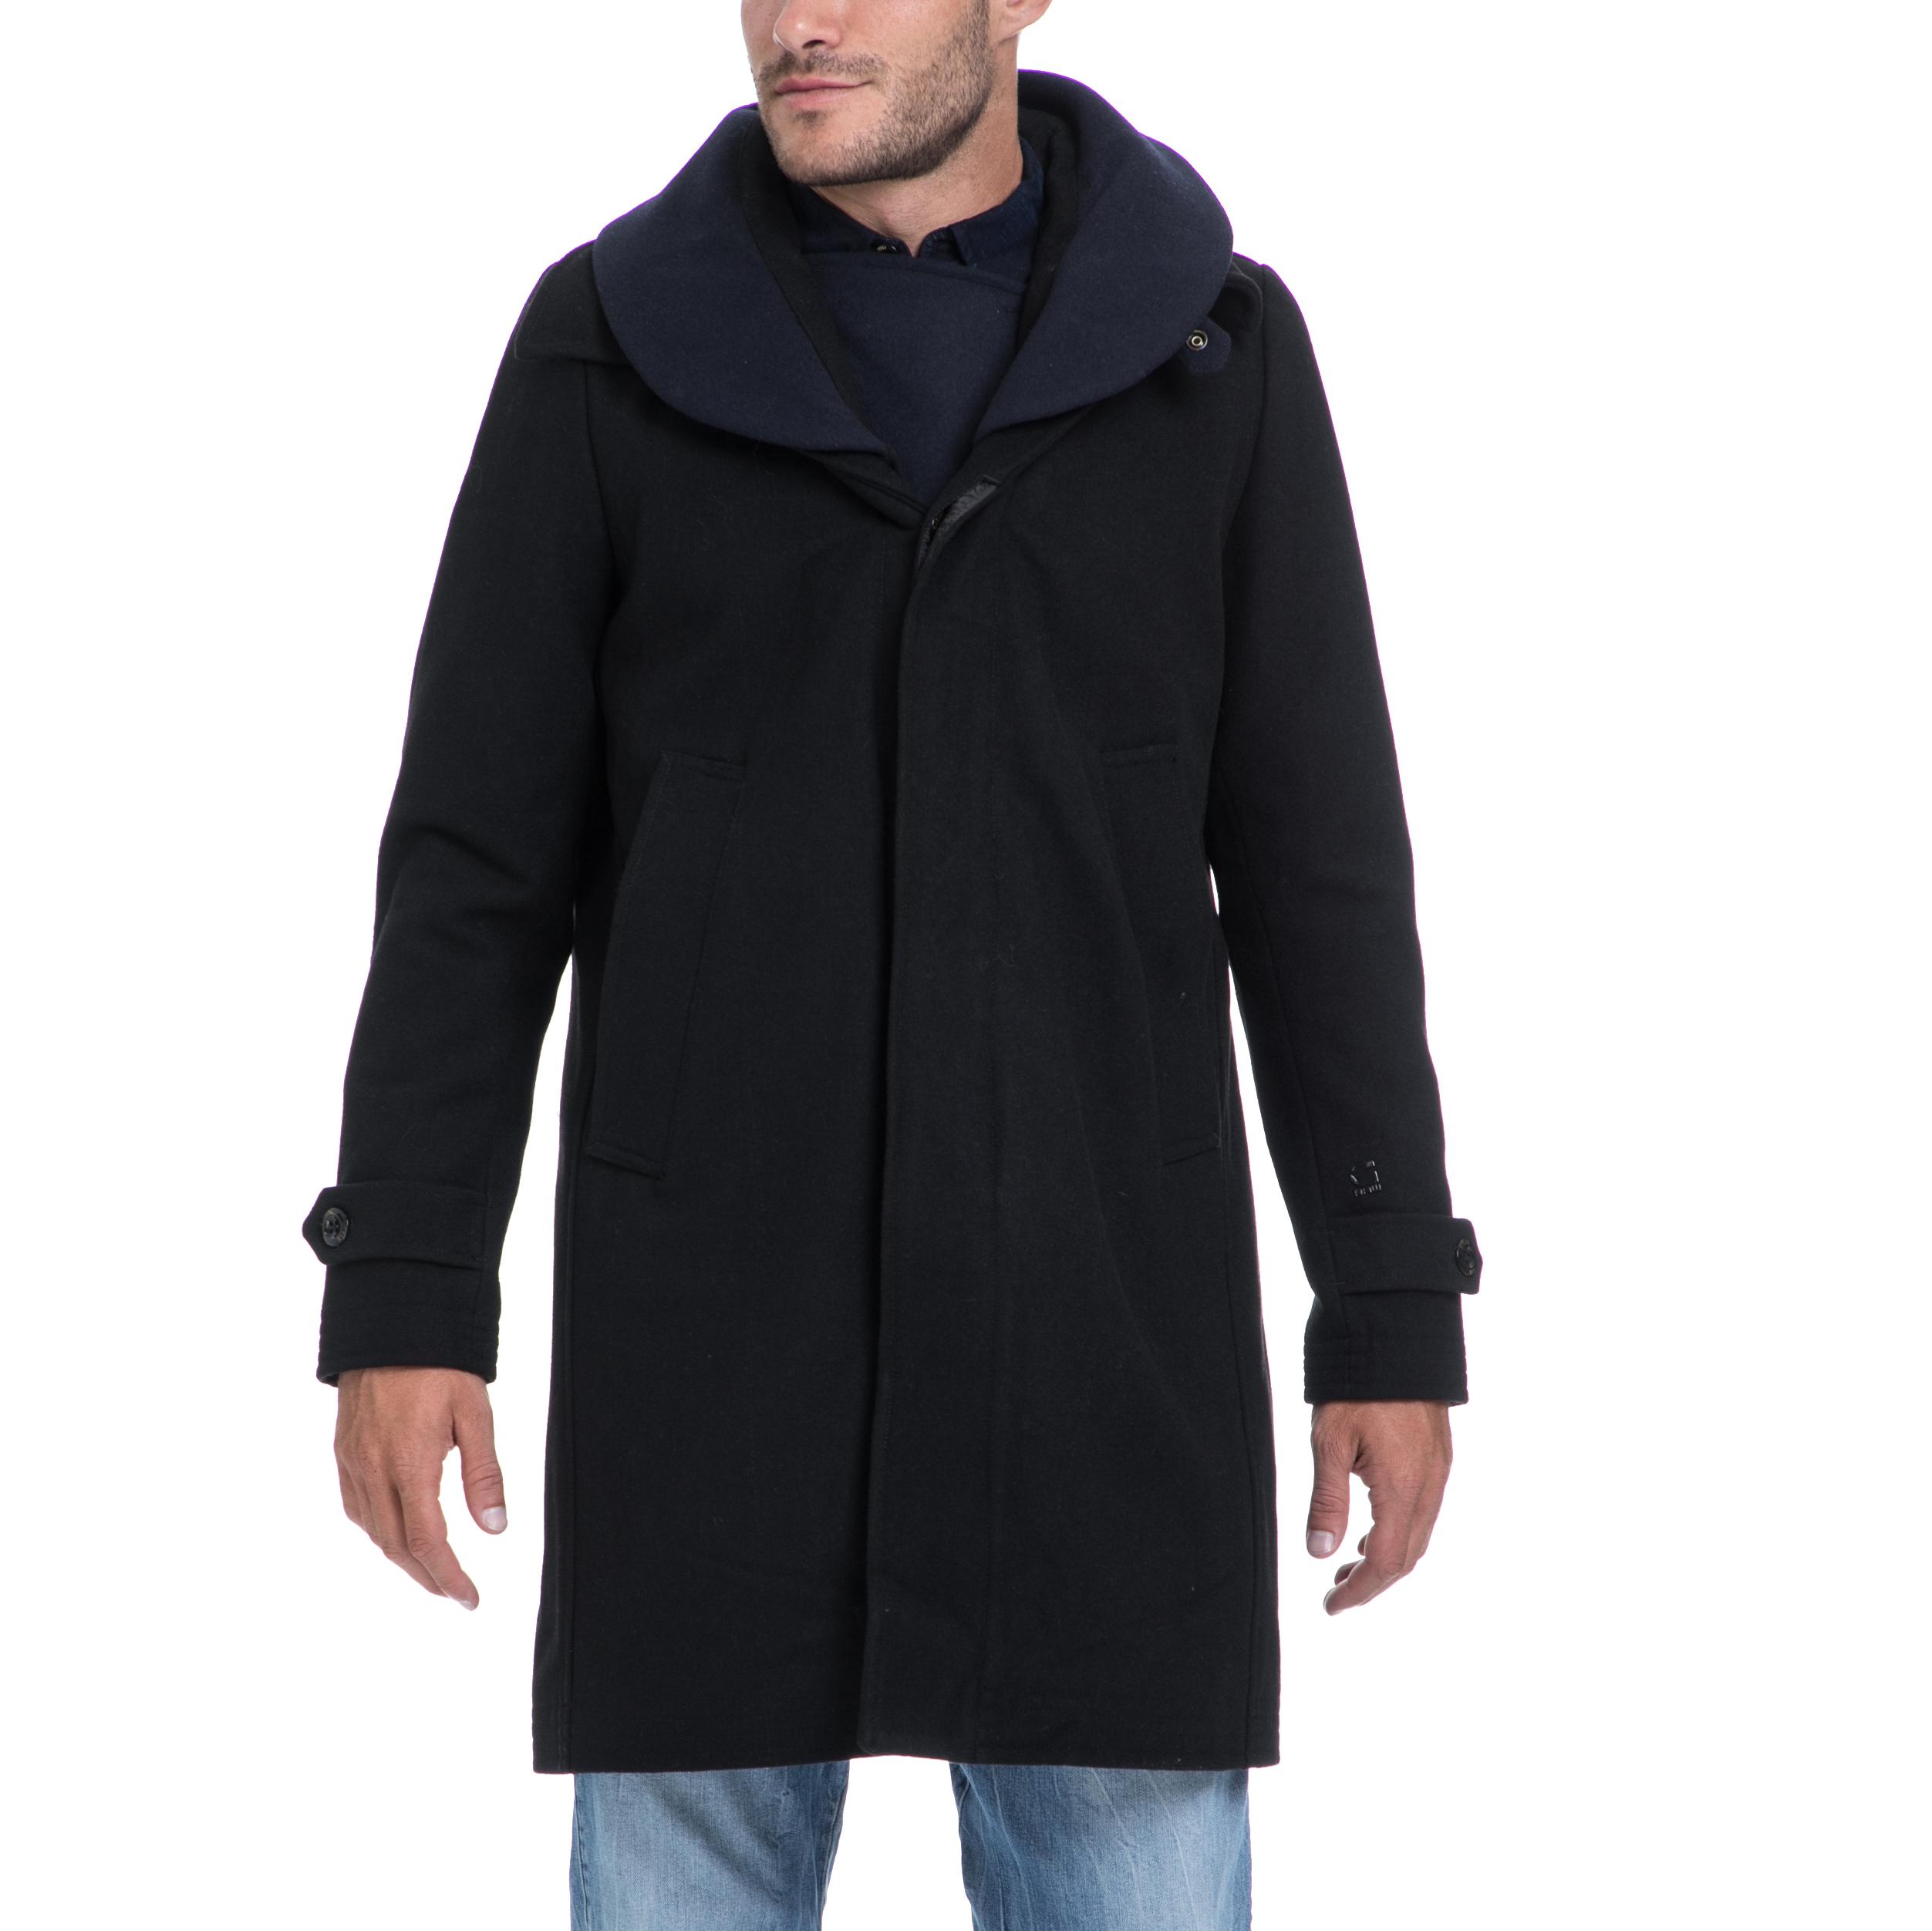 G-STAR RAW – Αντρικό παλτό G-STAR RAW μαύρο